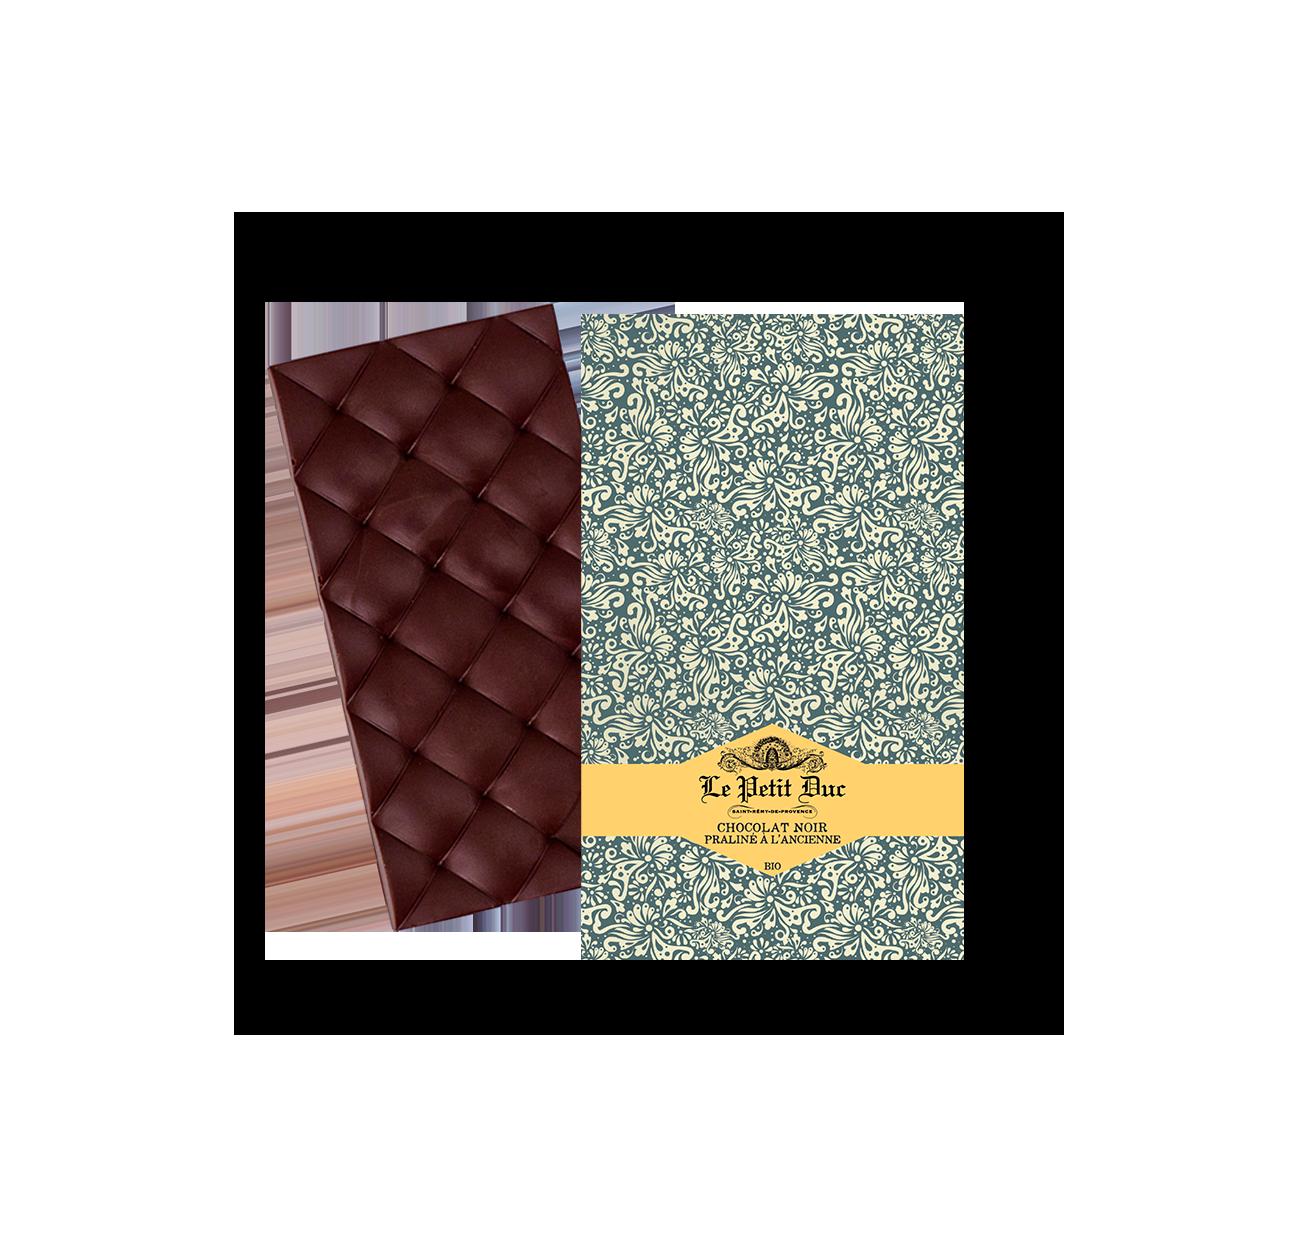 05/ Mørk sjokolade med pralin, 70g - Le Petit Duc